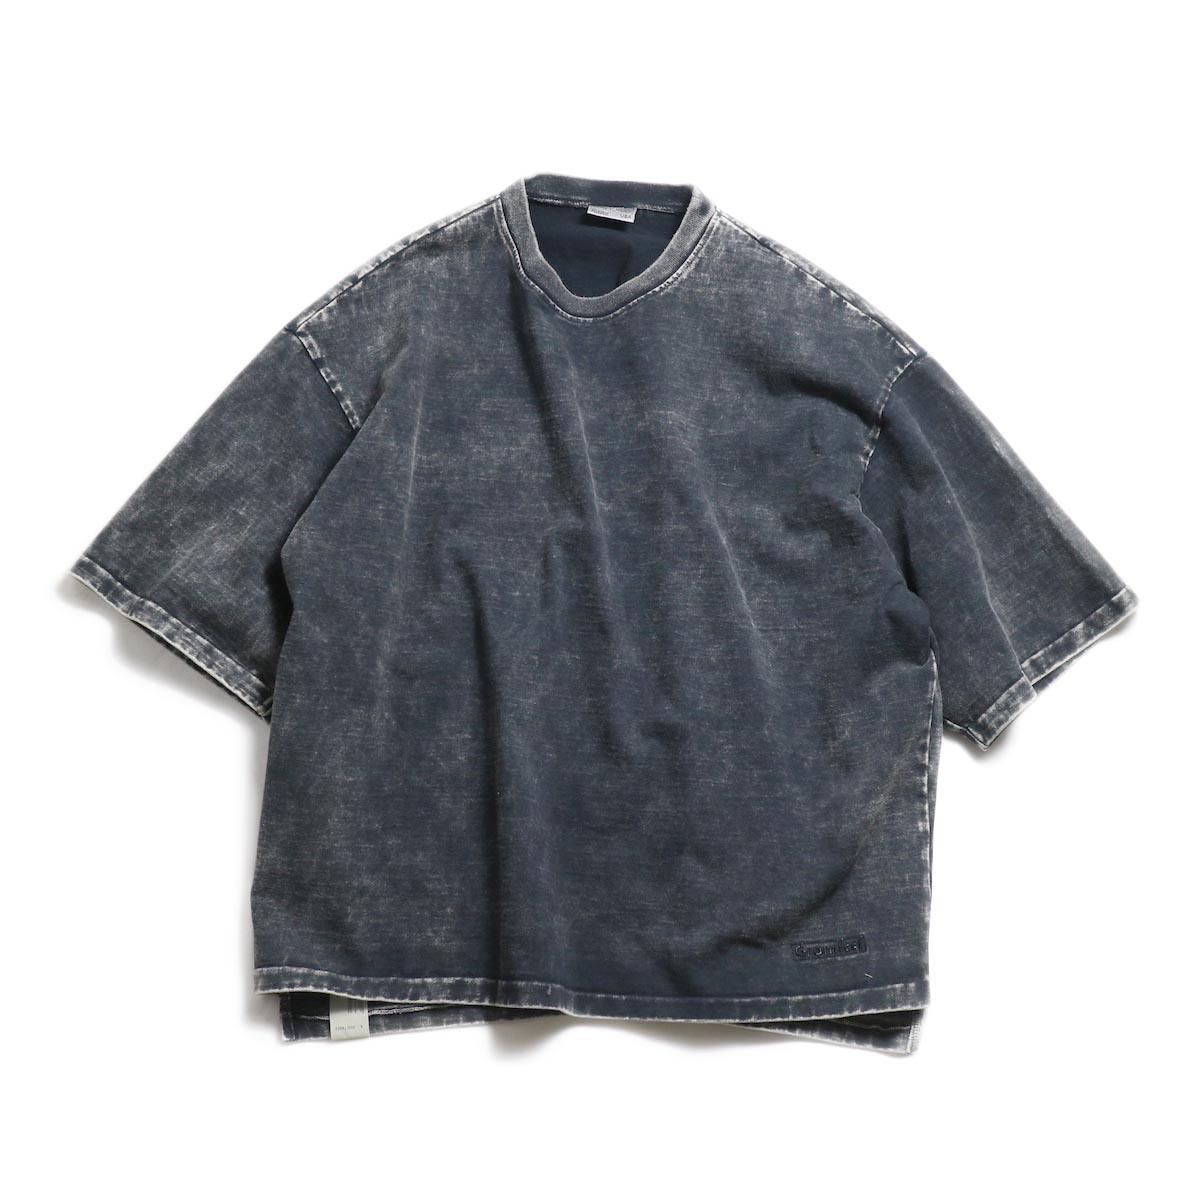 N.HOOLYWOOD × Gramicci  / 191-CS27-024 Short Sleeve Tee -Black 正面